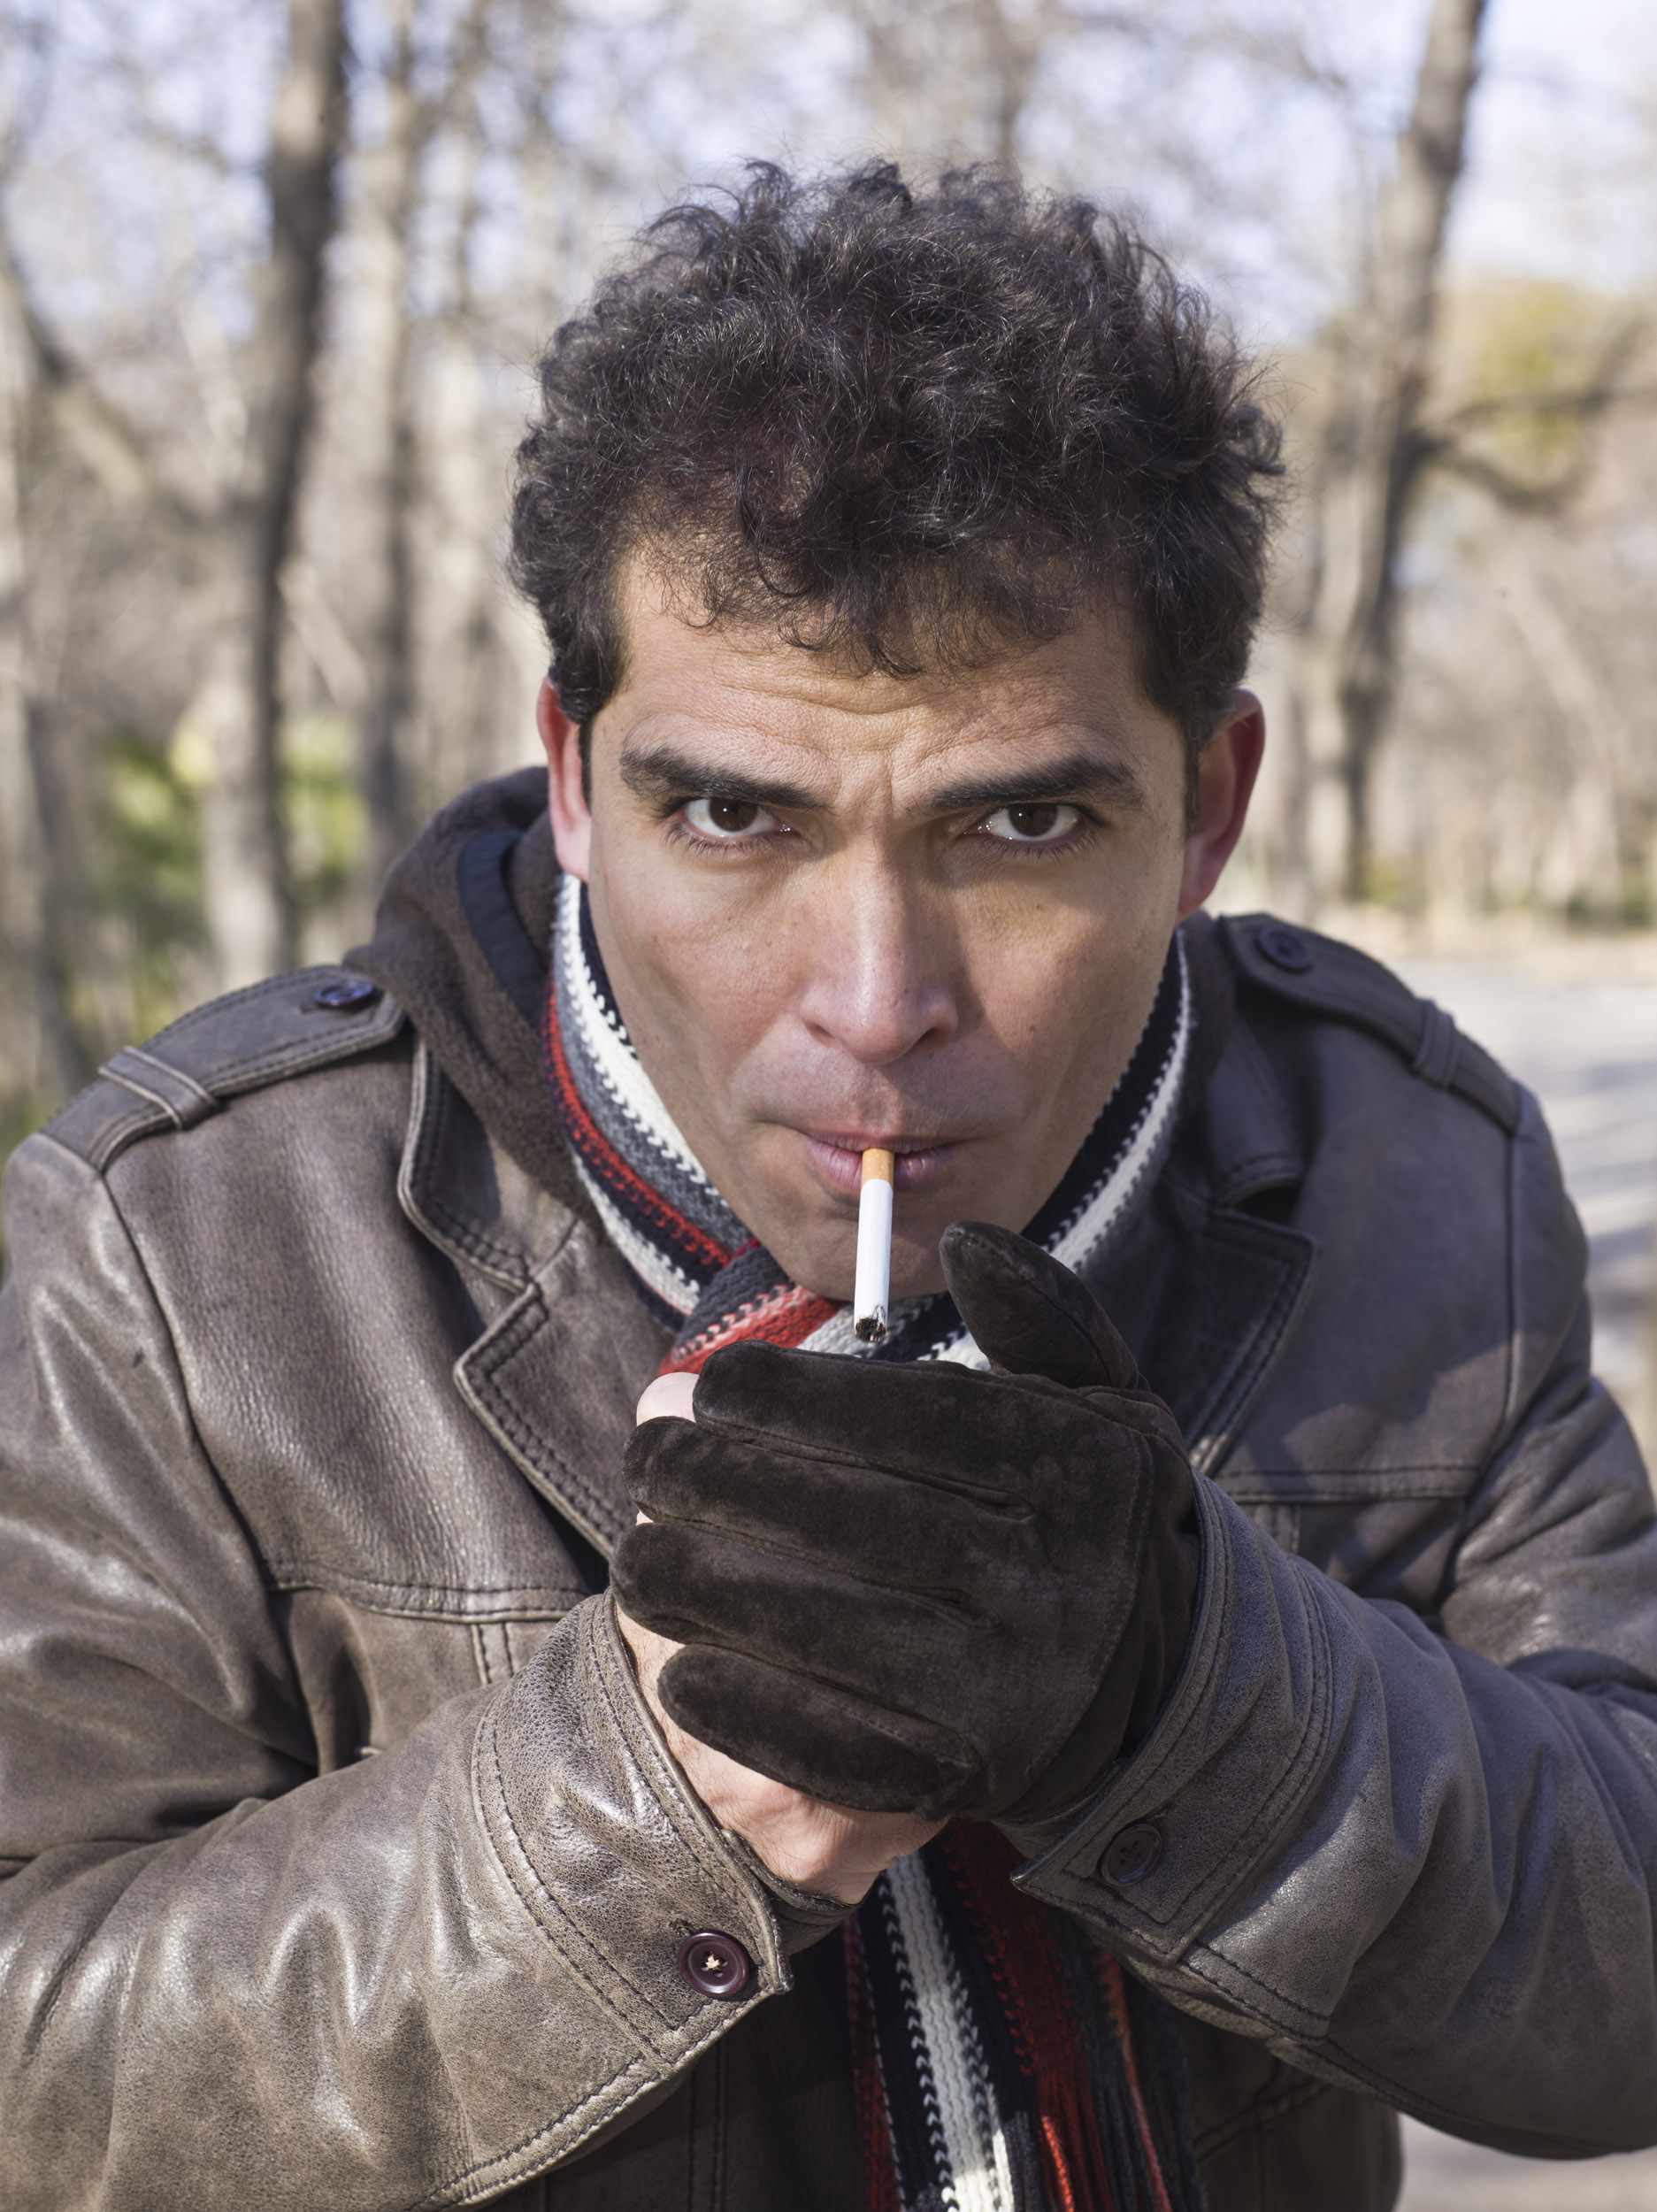 Vladimir Cruz, actor - Illuminated Cuba - Hector Garrido, Aerial and human photography